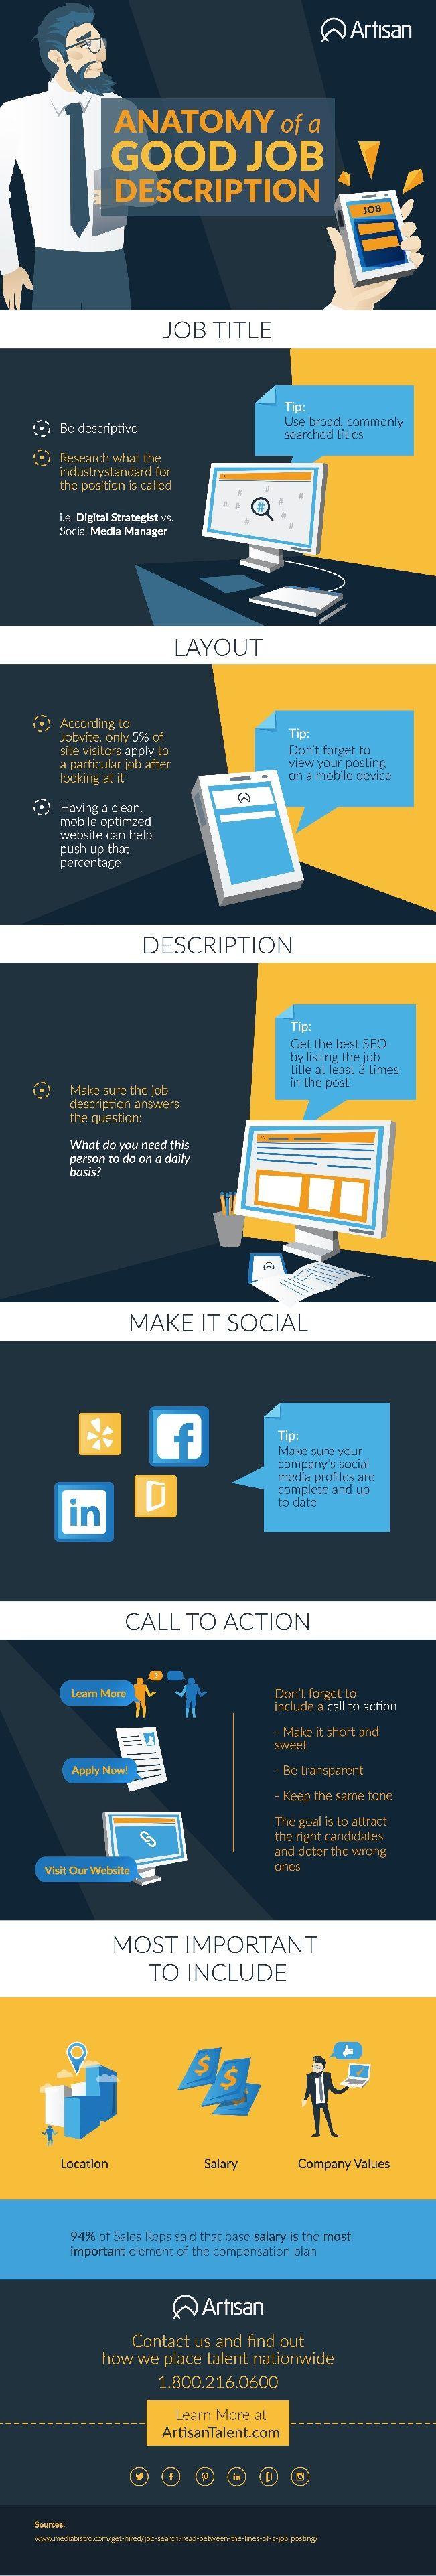 Best Infographics Images On   Digital Marketing